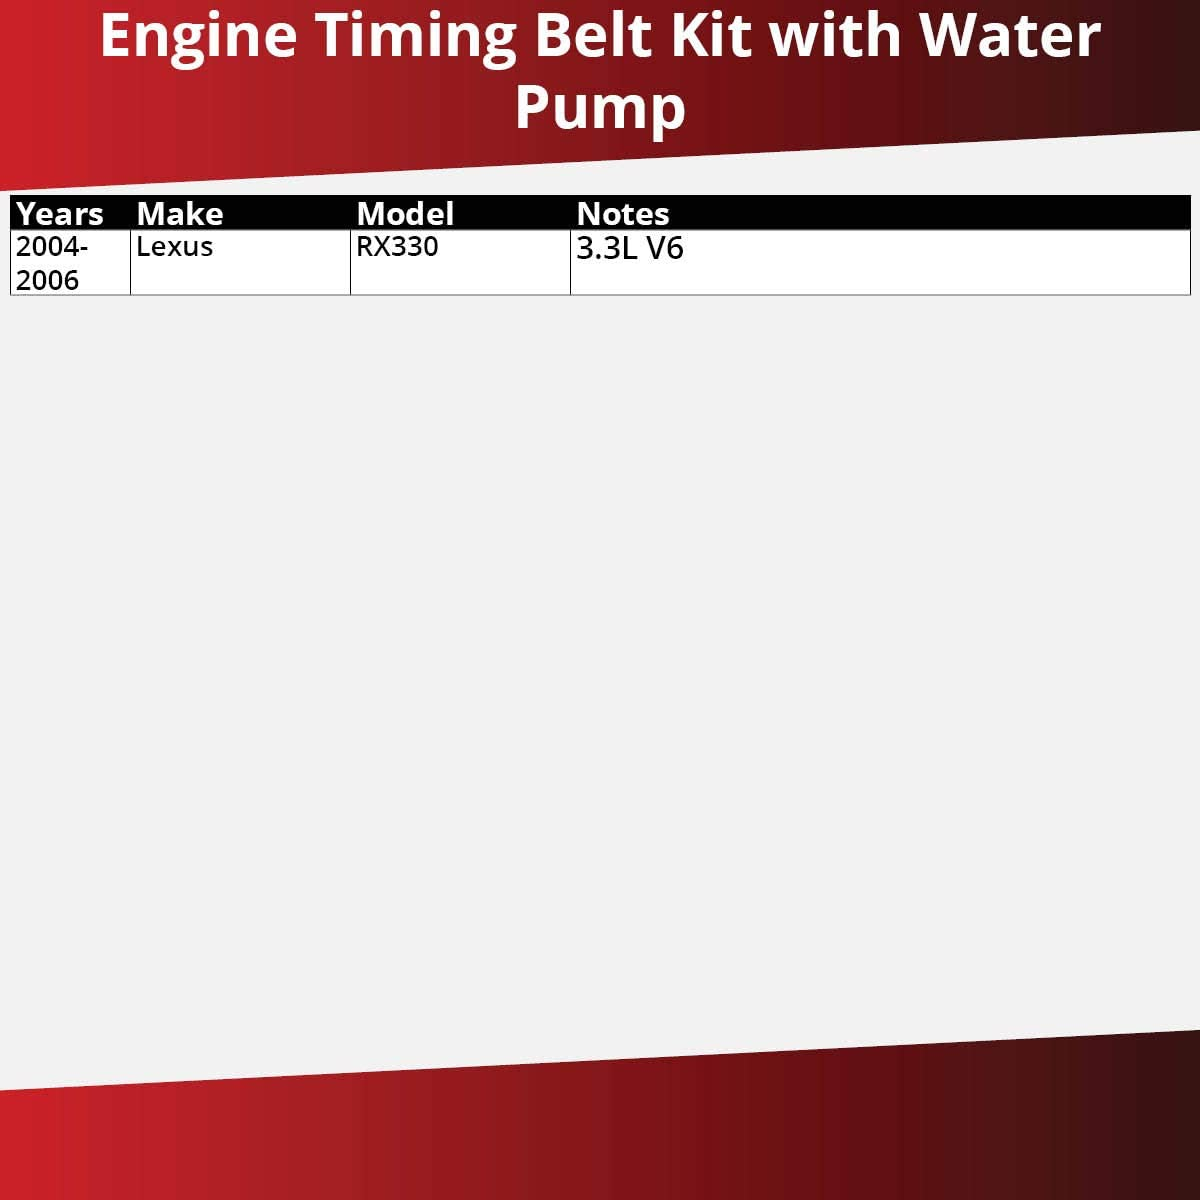 Engine oe Gates Timing Belt Water Pump Kit for 2004-2006 Lexus RX330 3.3L V6